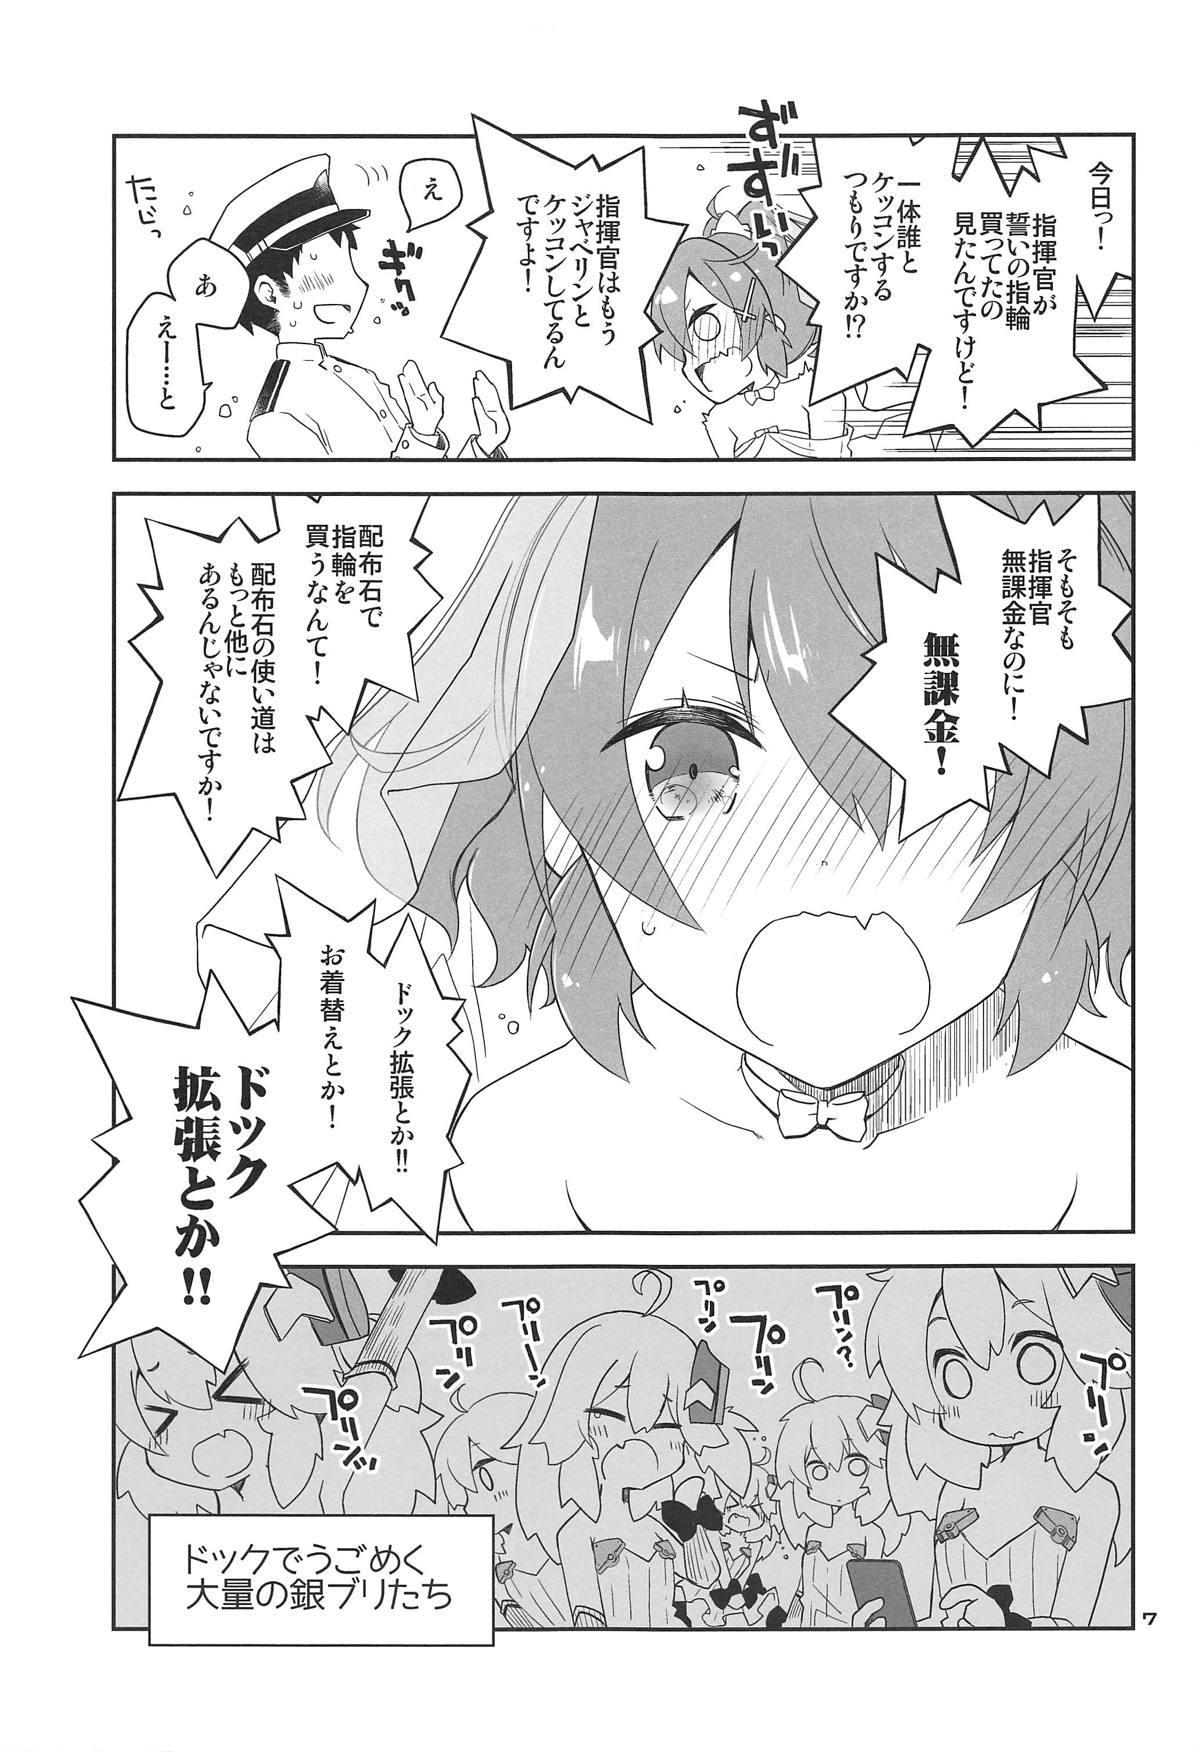 Mukakin Shikikan wa Javelin ni Eien no Ai o Chikau 5